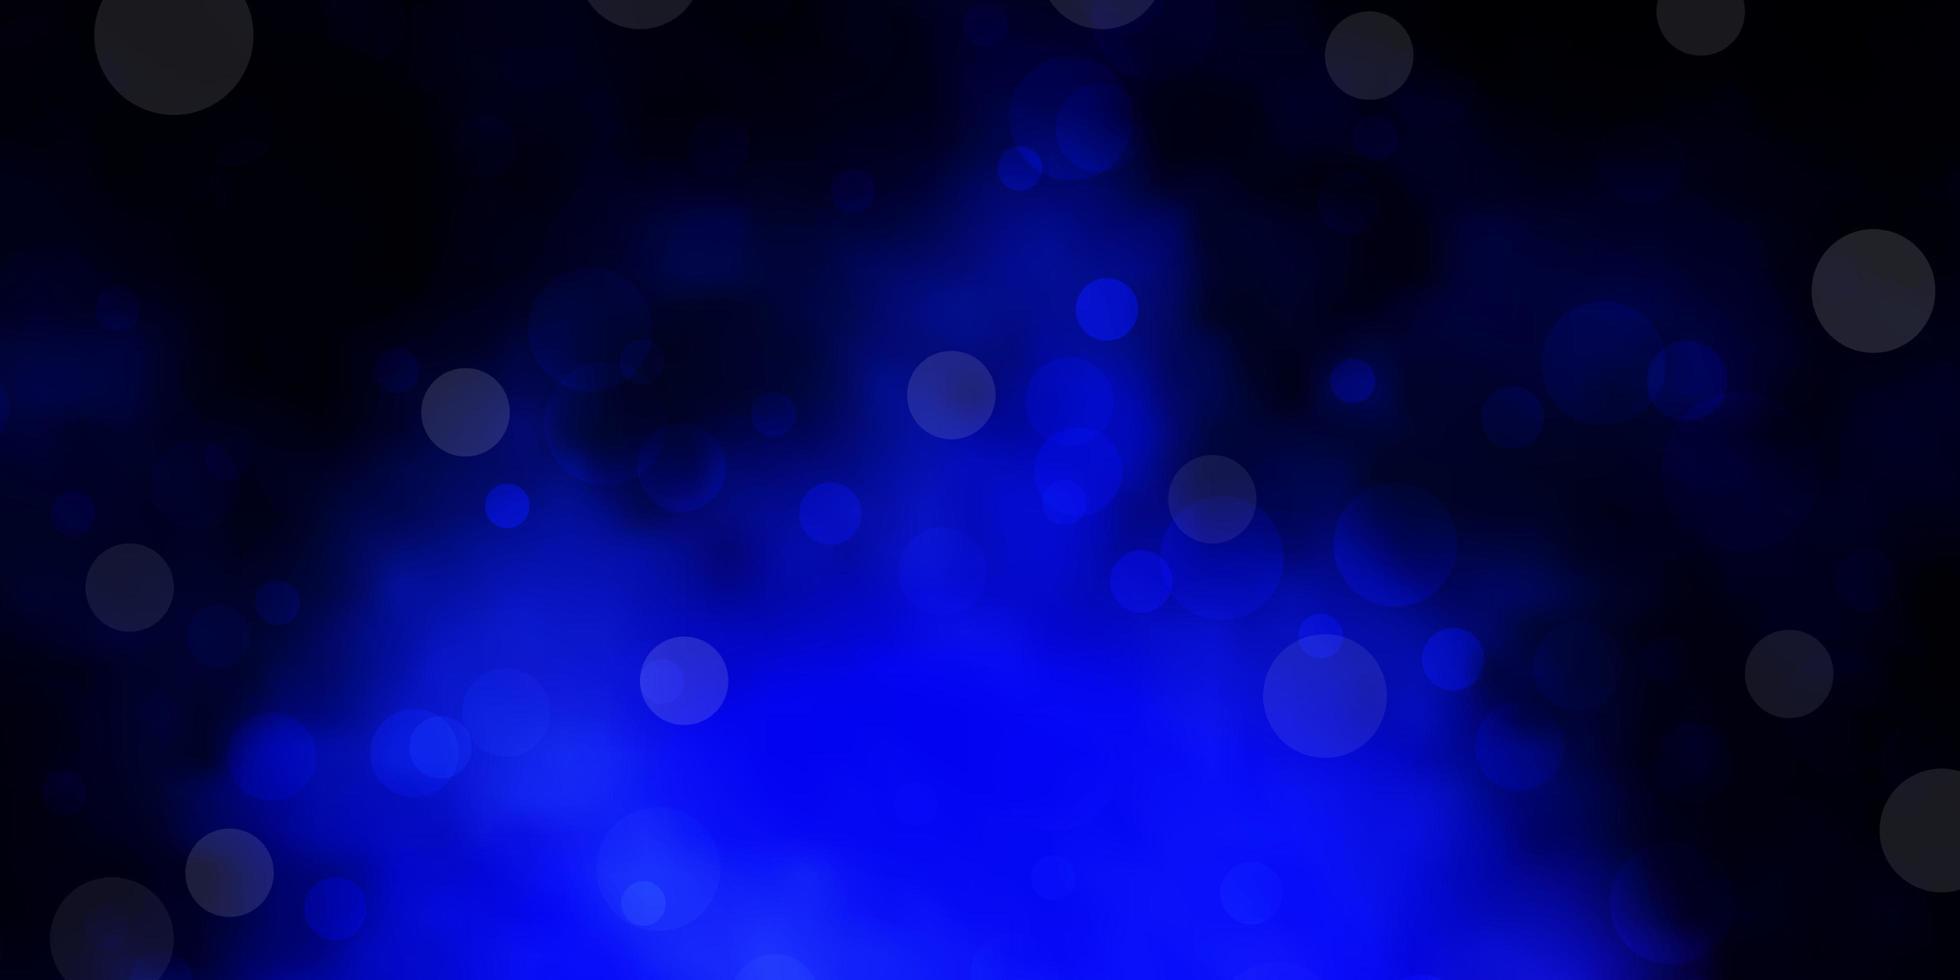 dunkelblaues Muster mit Kugeln. vektor